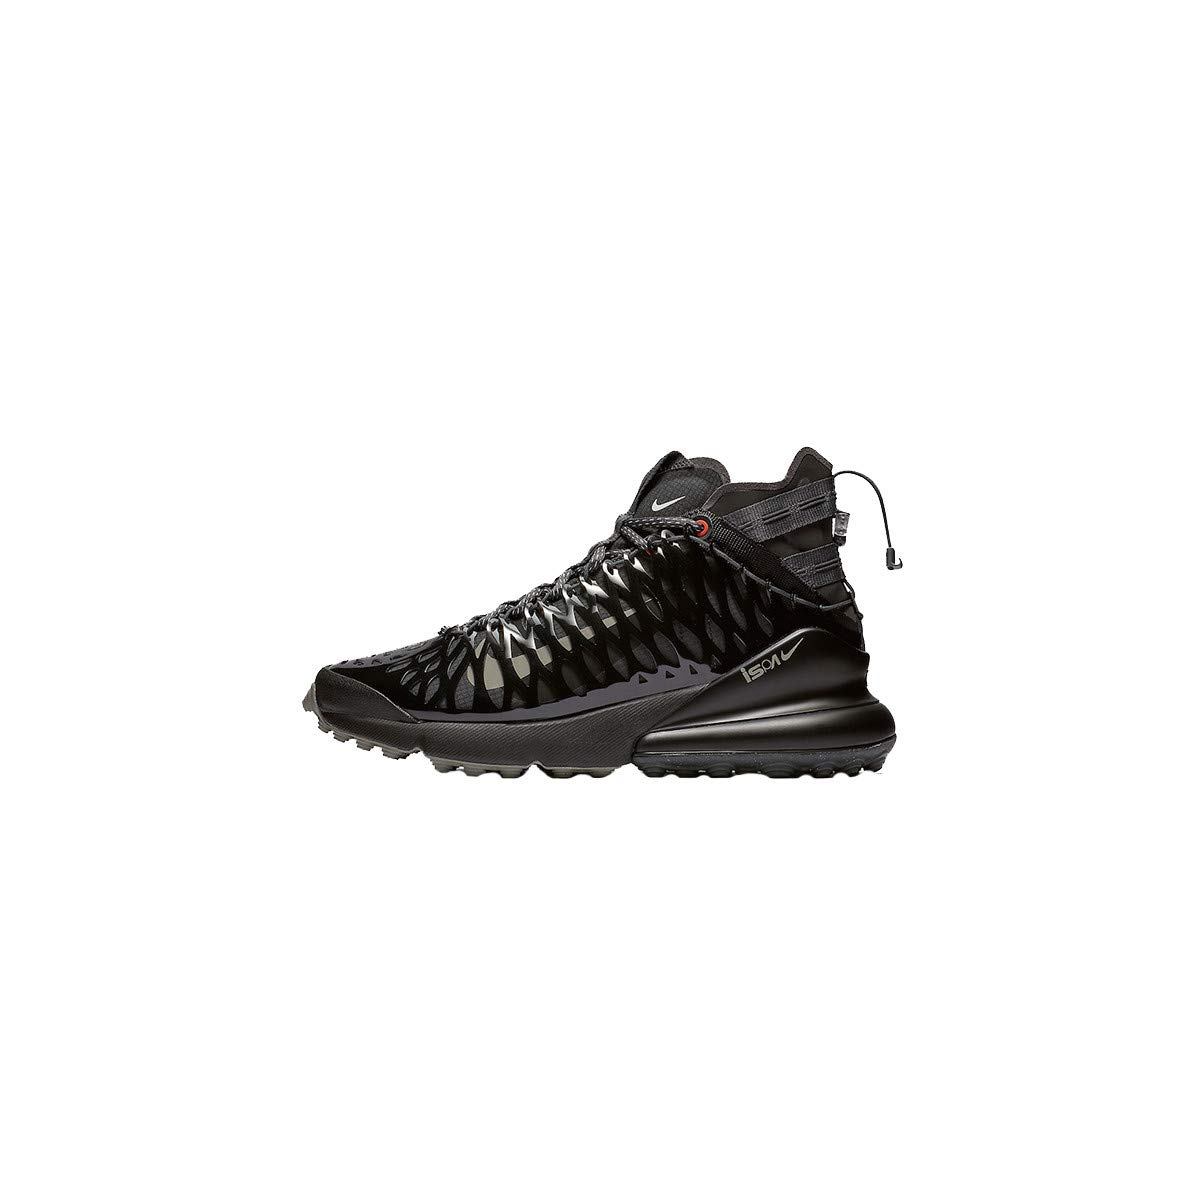 3dabd386e2182 Amazon.com | Nike Air Max 270 SOE Mens Bq1918-002 Size 10.5 | Shoes